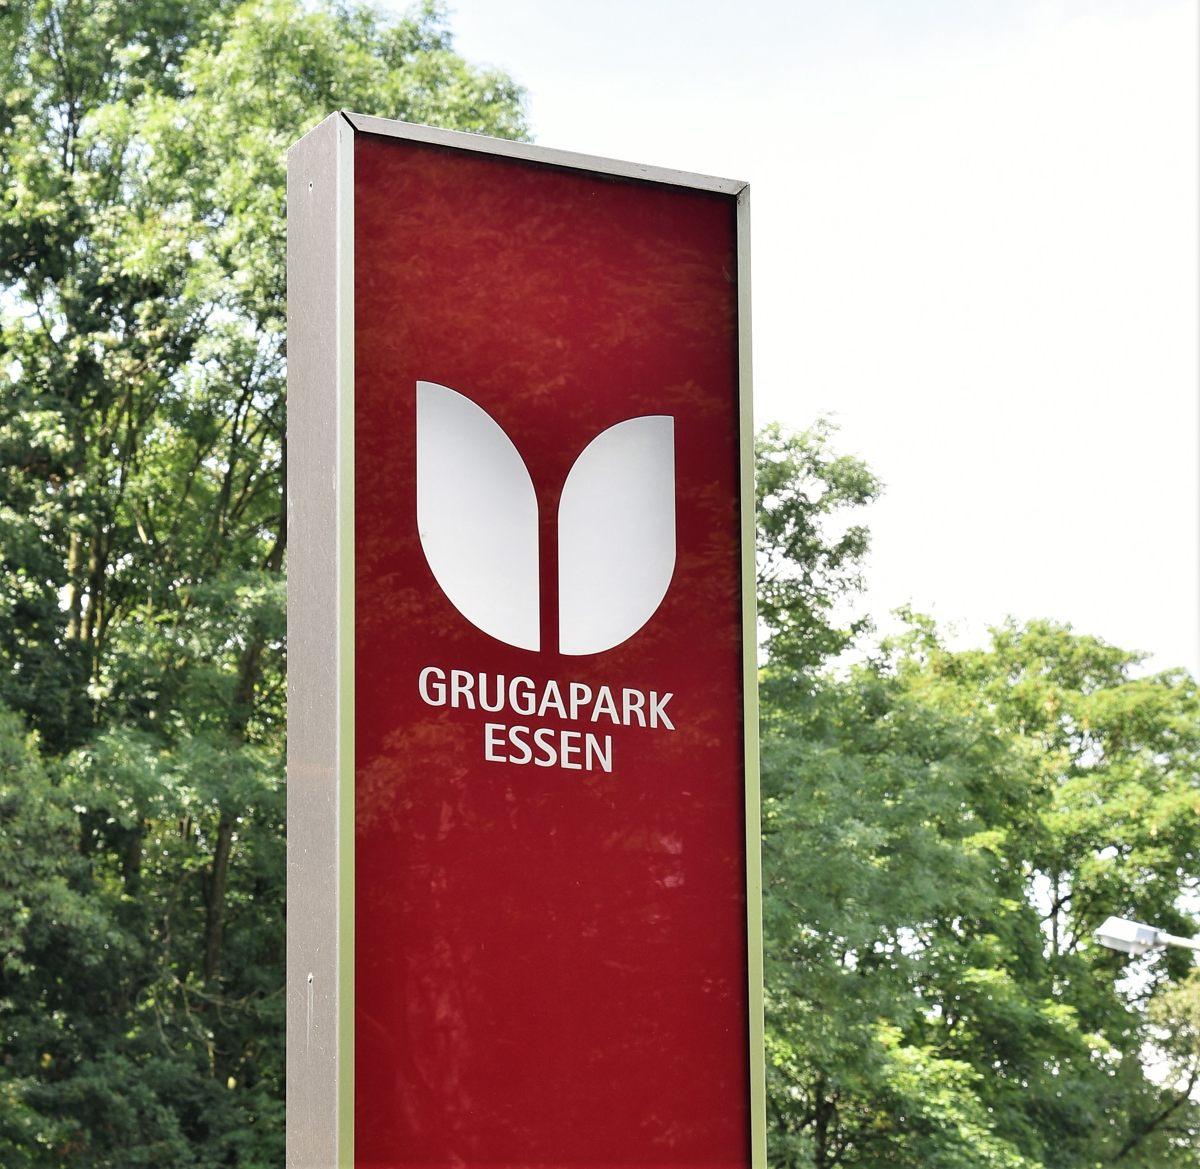 Bloggertreffen Summer Feeling 2017 im Grugapark Essen